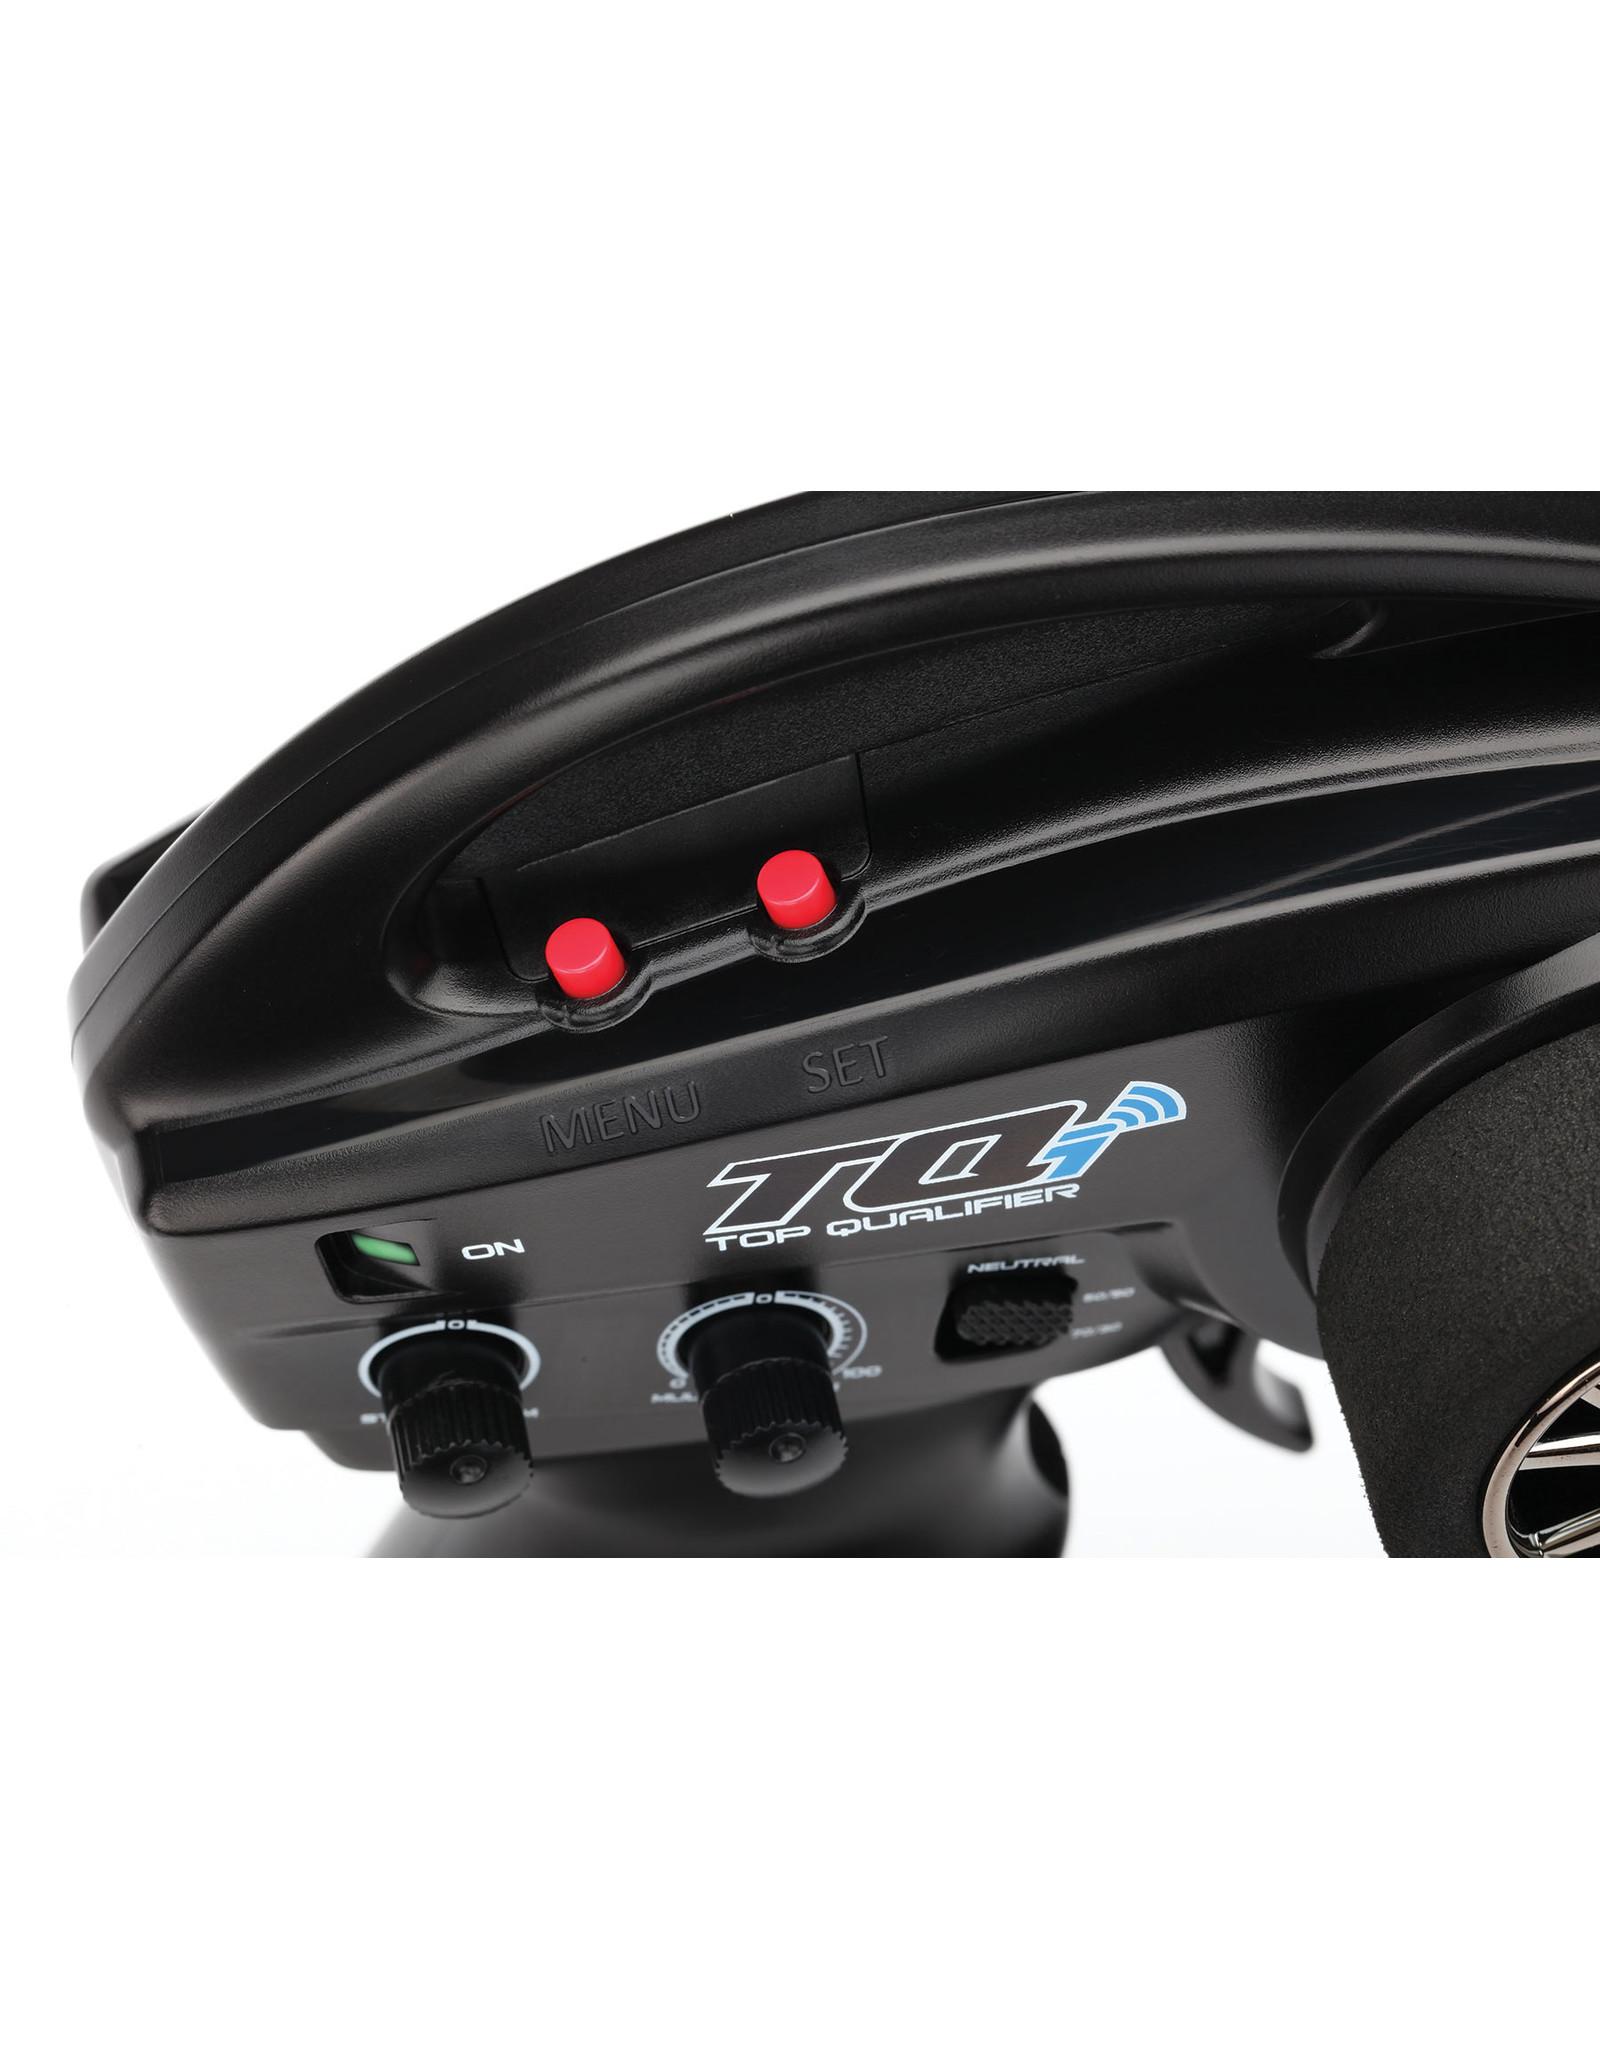 Traxxas 6509R - TQi 2.4GHz 2-Channel Radio System w/TSM & Micro Receiver